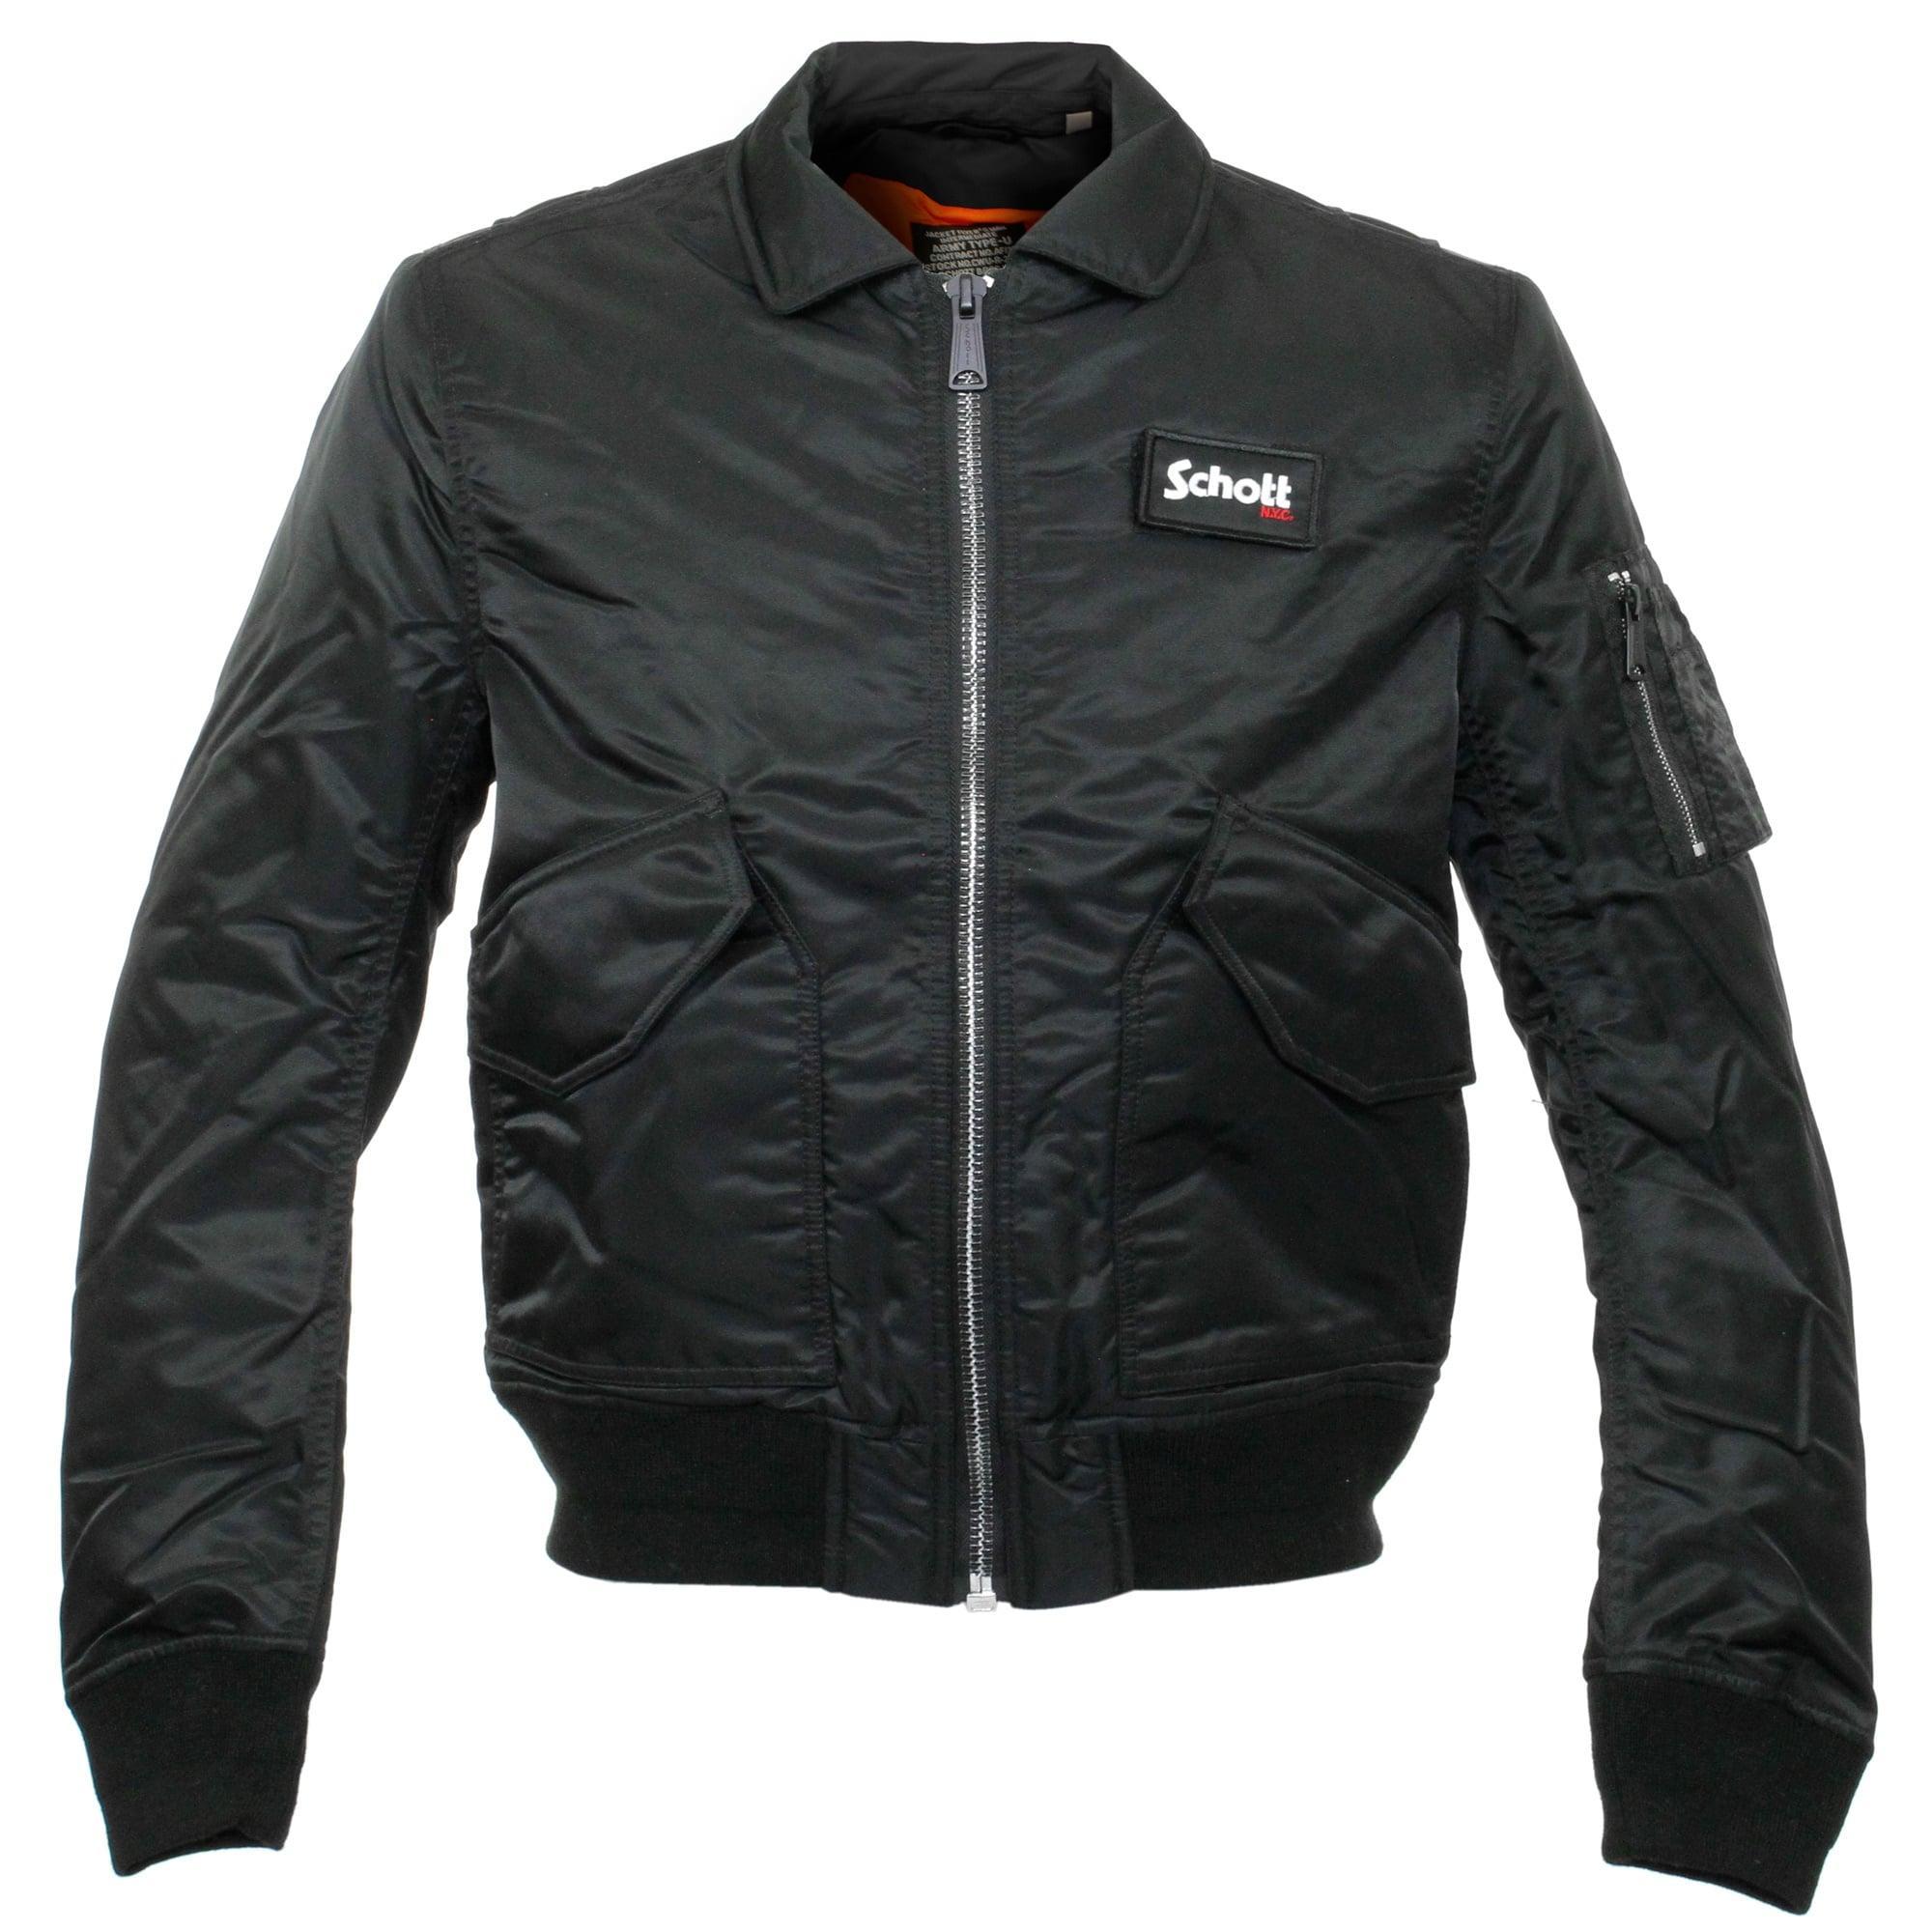 schott nyc schott cwu r black bomber flight jacket in black for men lyst. Black Bedroom Furniture Sets. Home Design Ideas